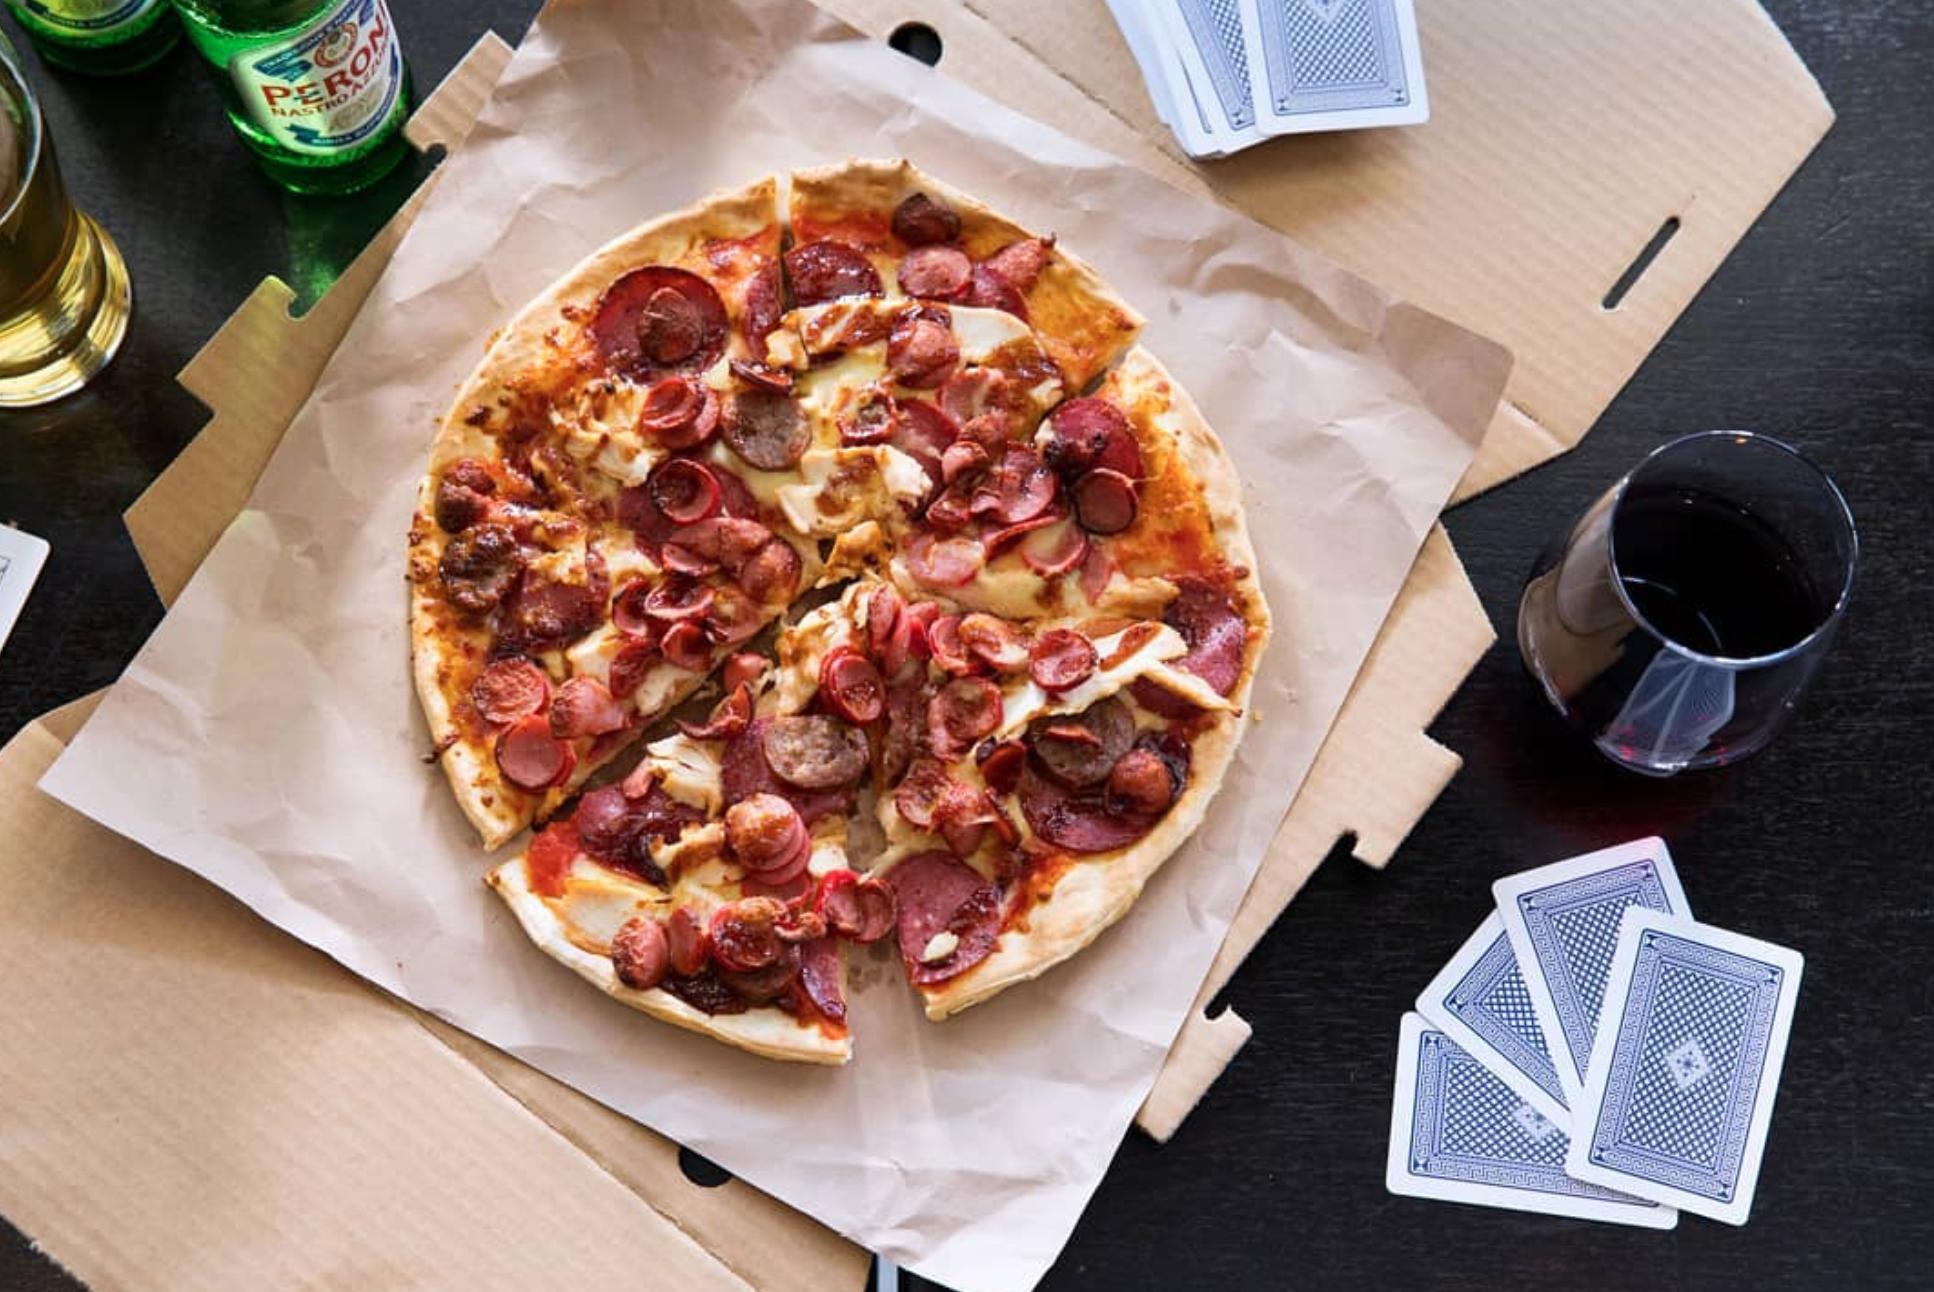 Arthur's Pizza Glebe